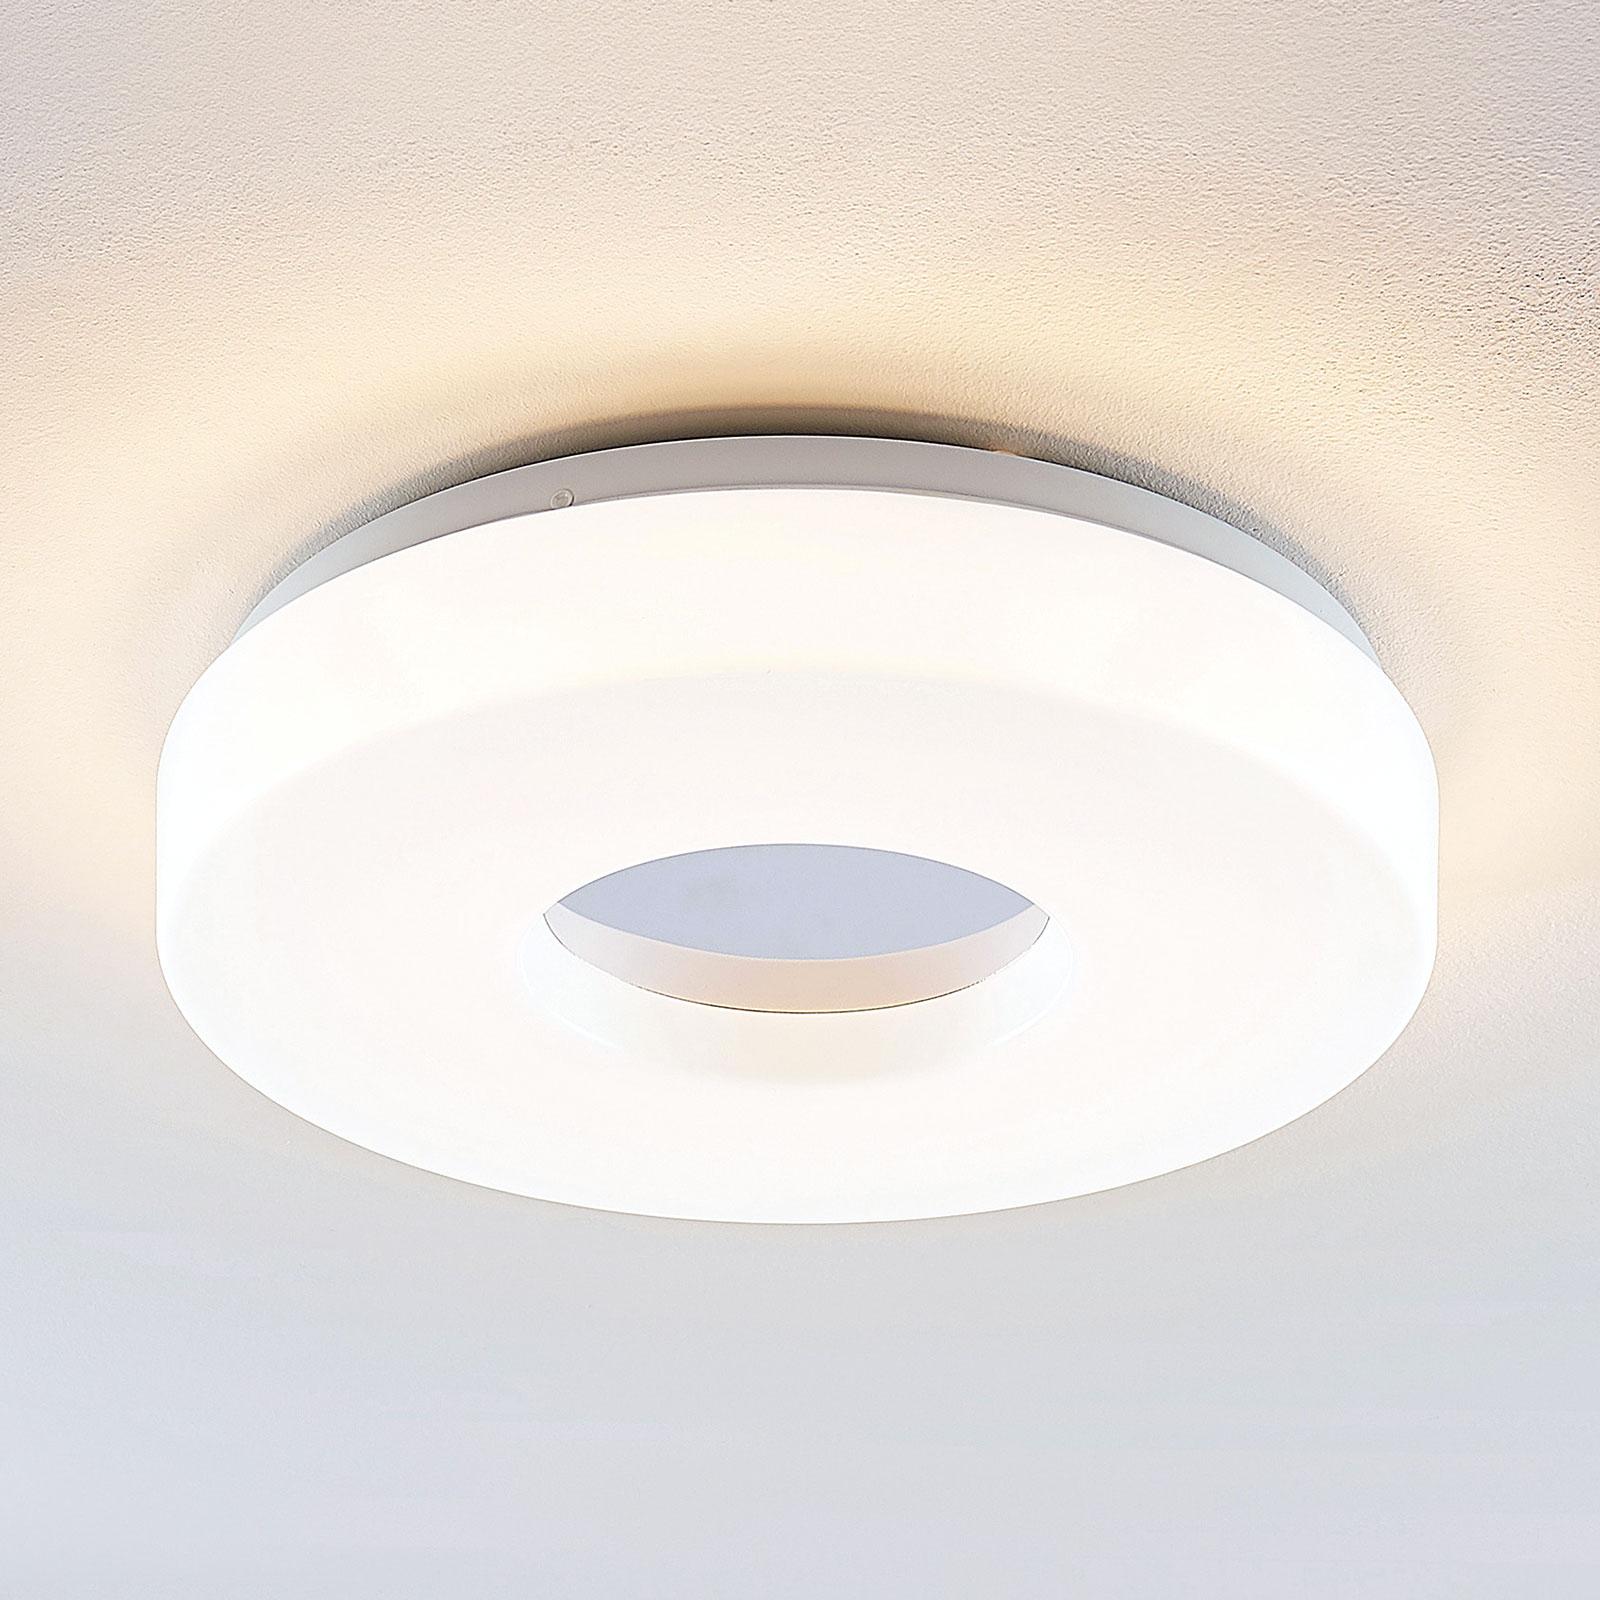 Lindby Florentina LED plafondlamp, ring, 34,5 cm